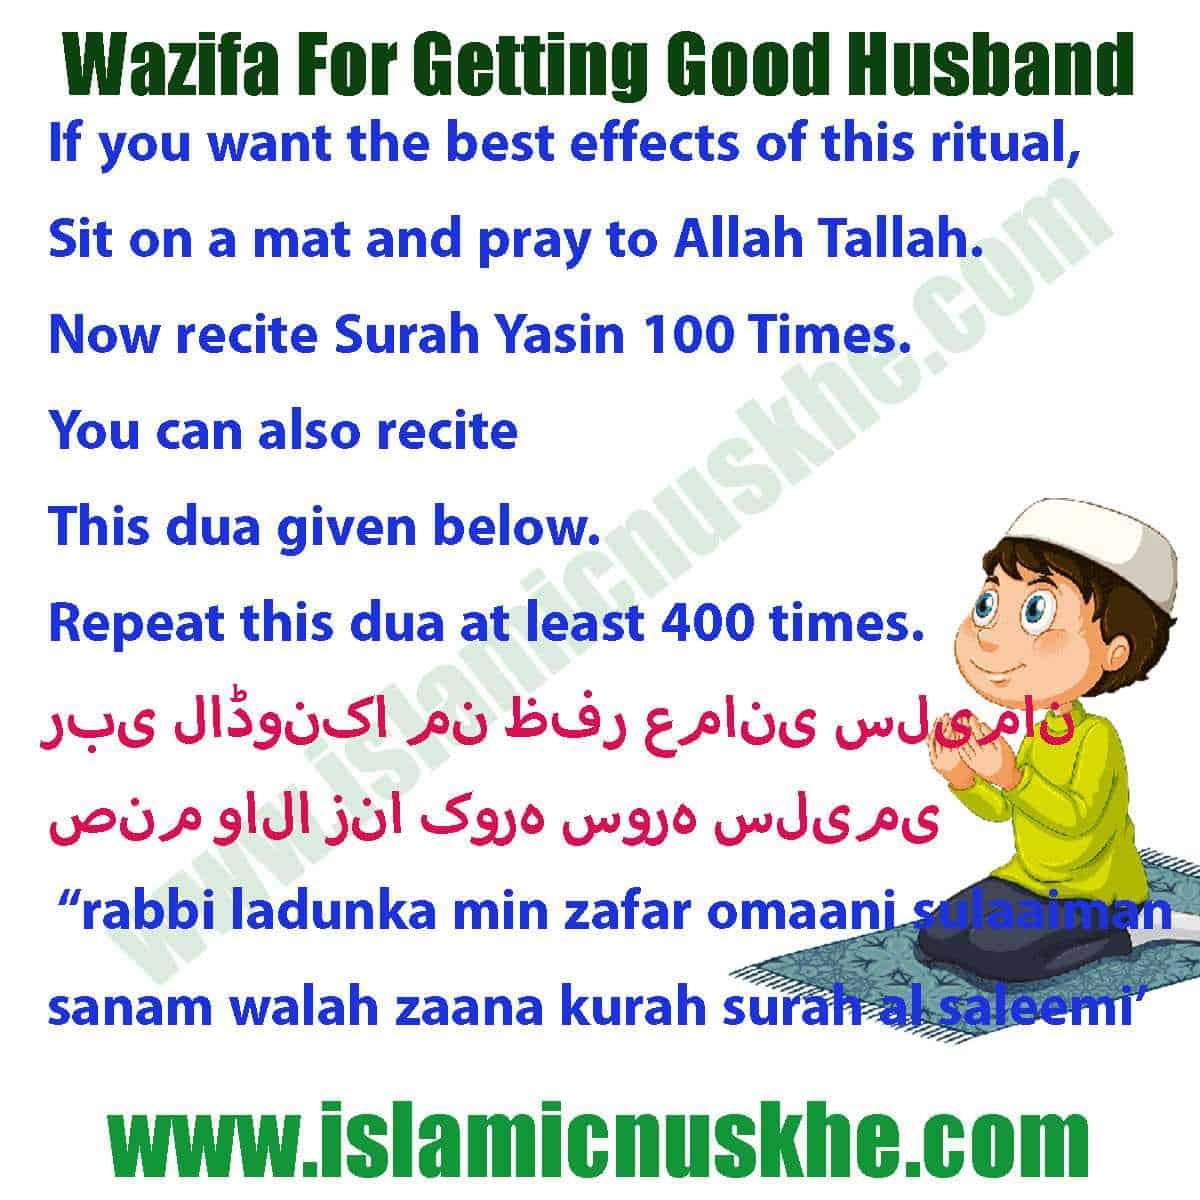 Here is Dua Or Wazifa For Getting Good Husband Step by Step